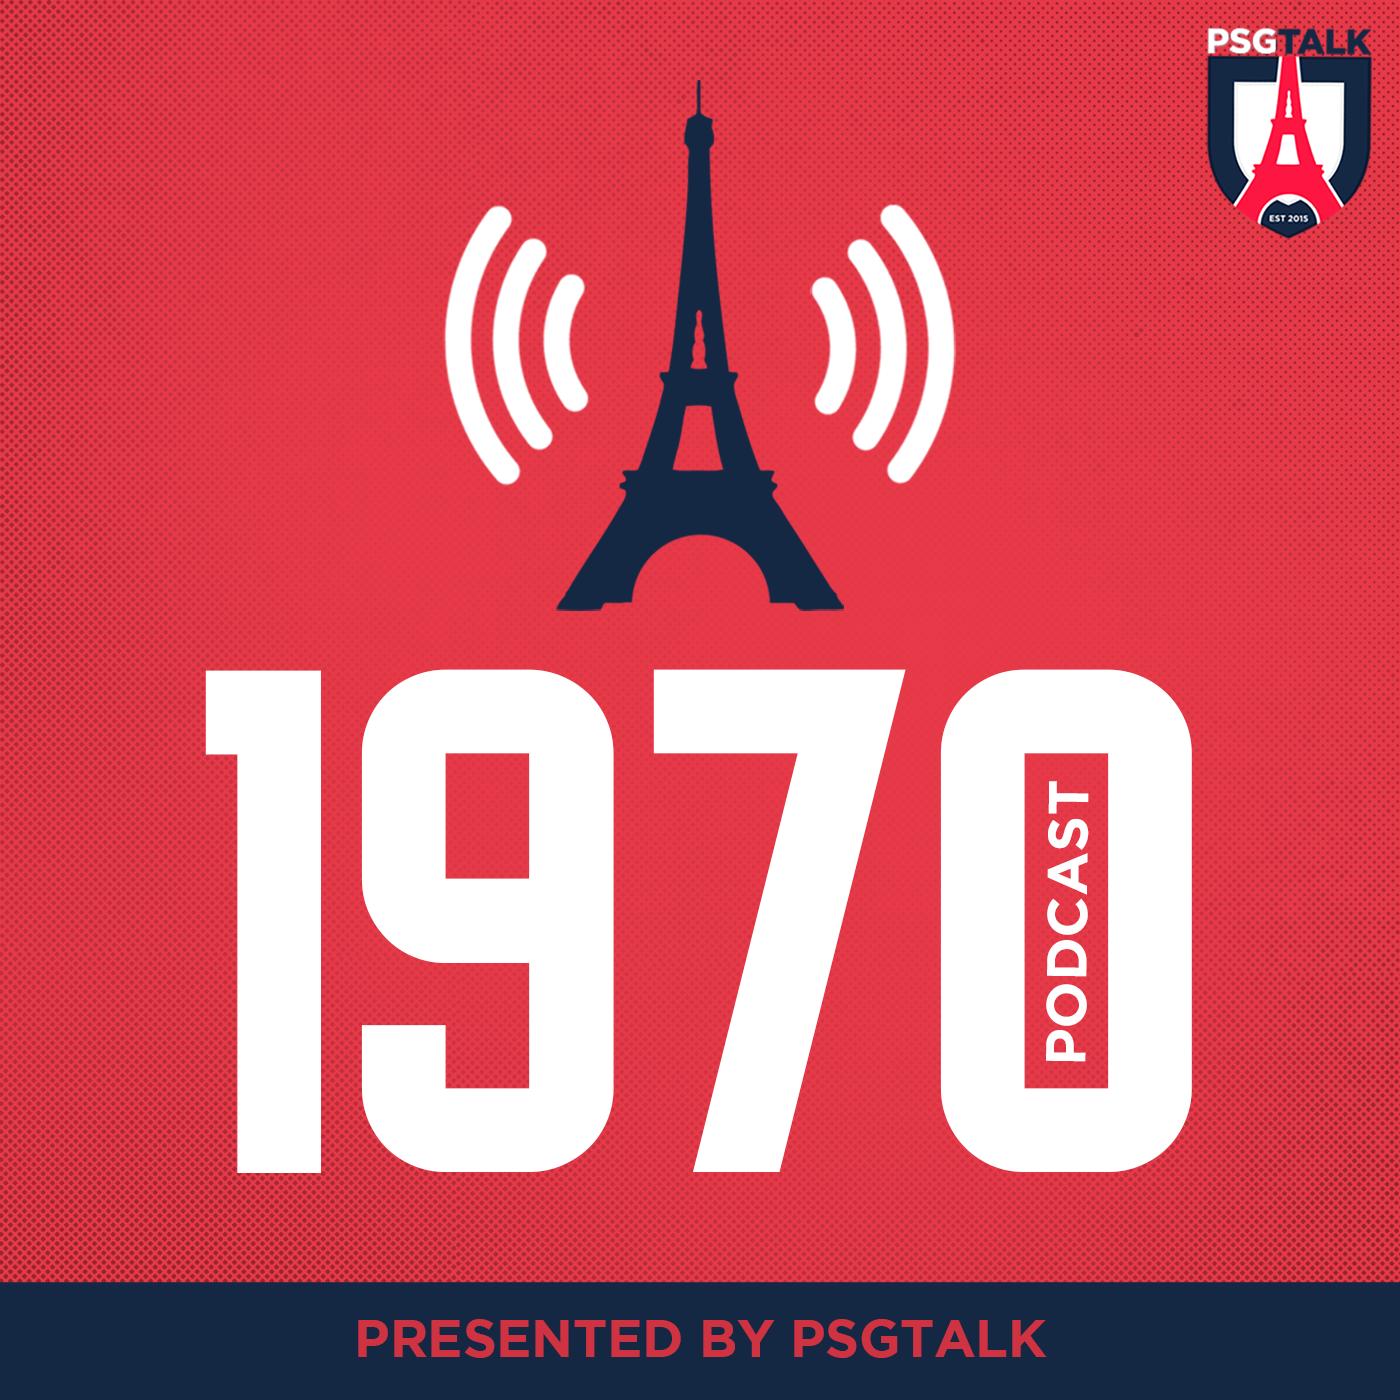 Artwork for podcast The 1970